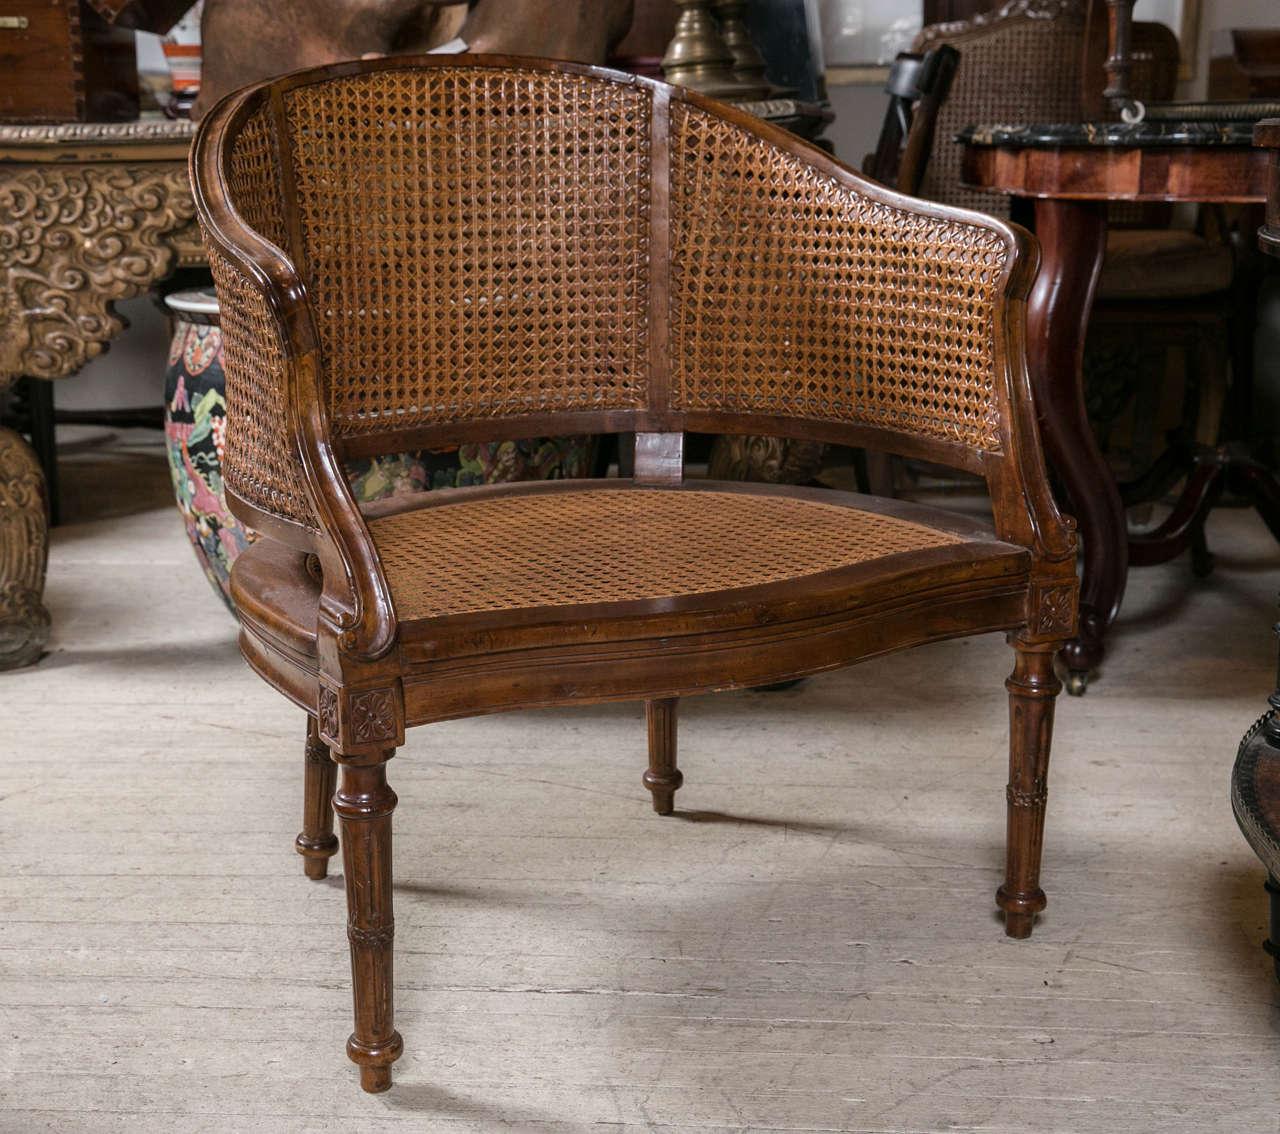 Antique louis xvi chair - Antique Louis Xvi Caned Desk Chair 3